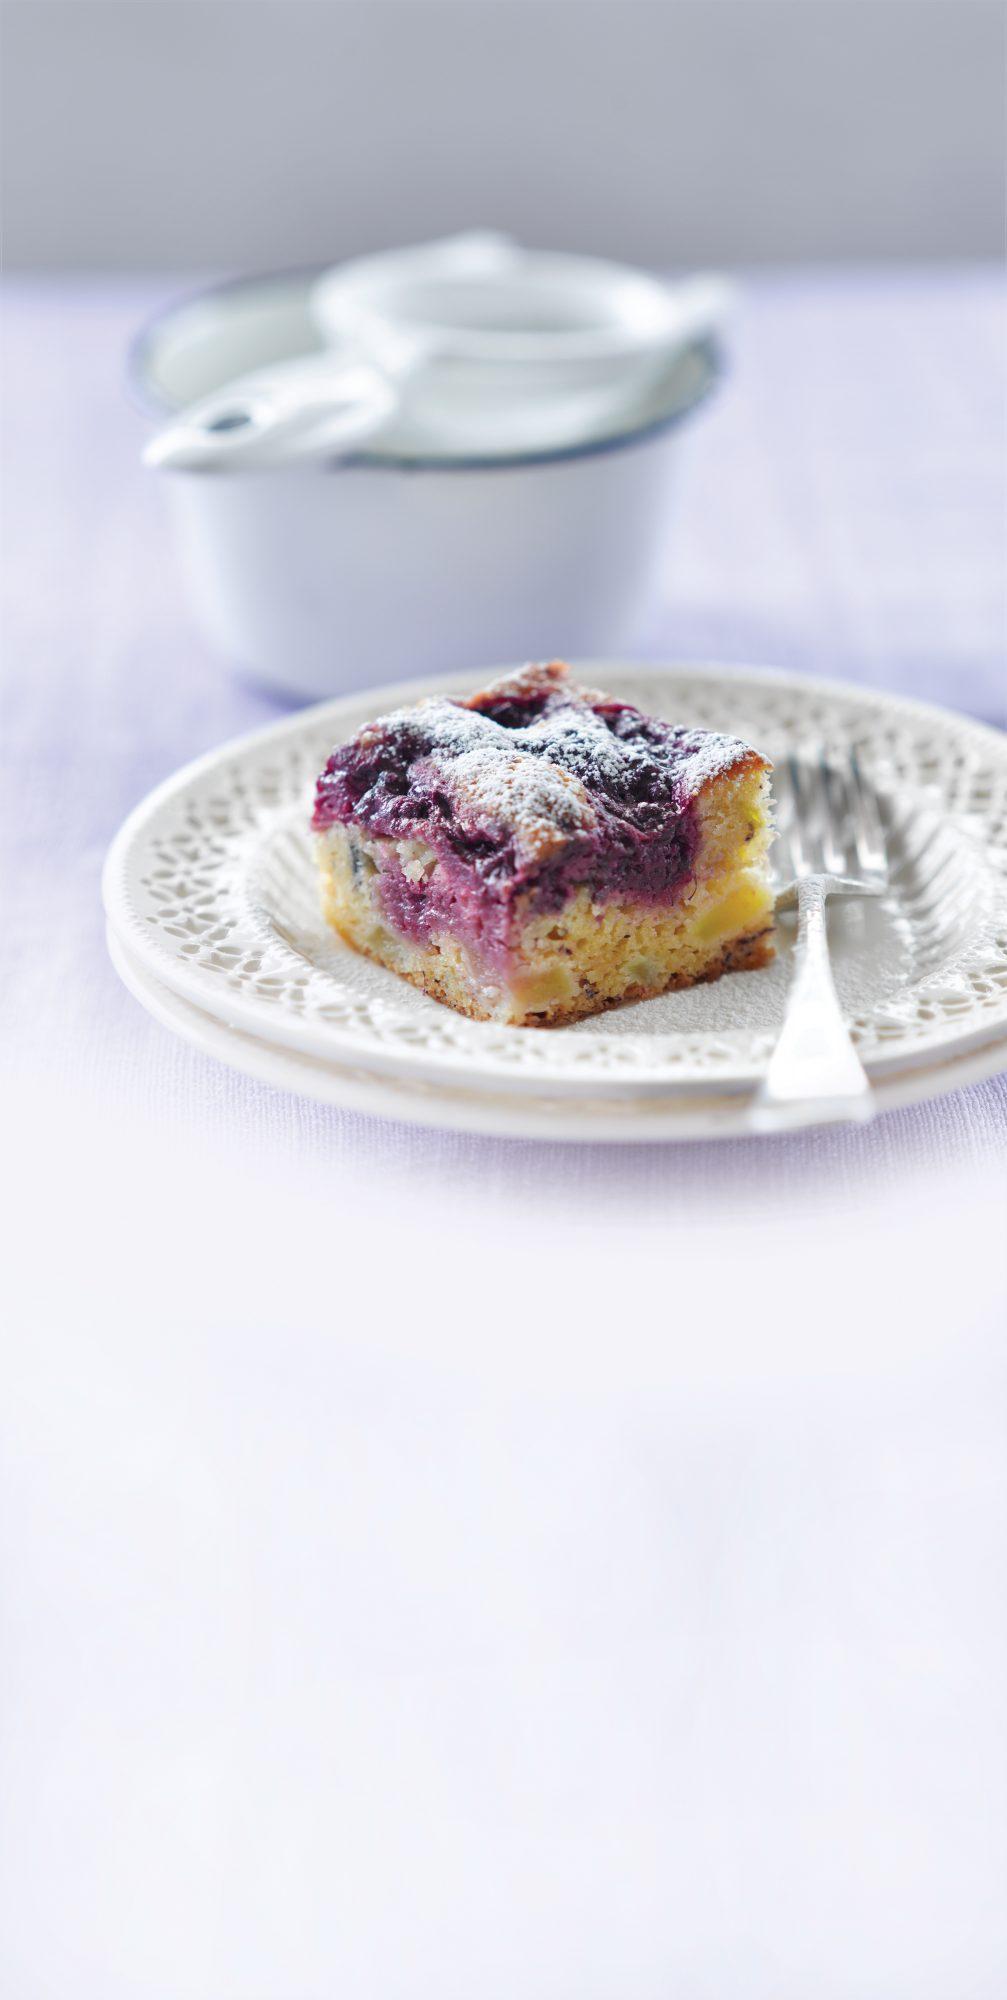 Apple and boysenberry gluten-free bake